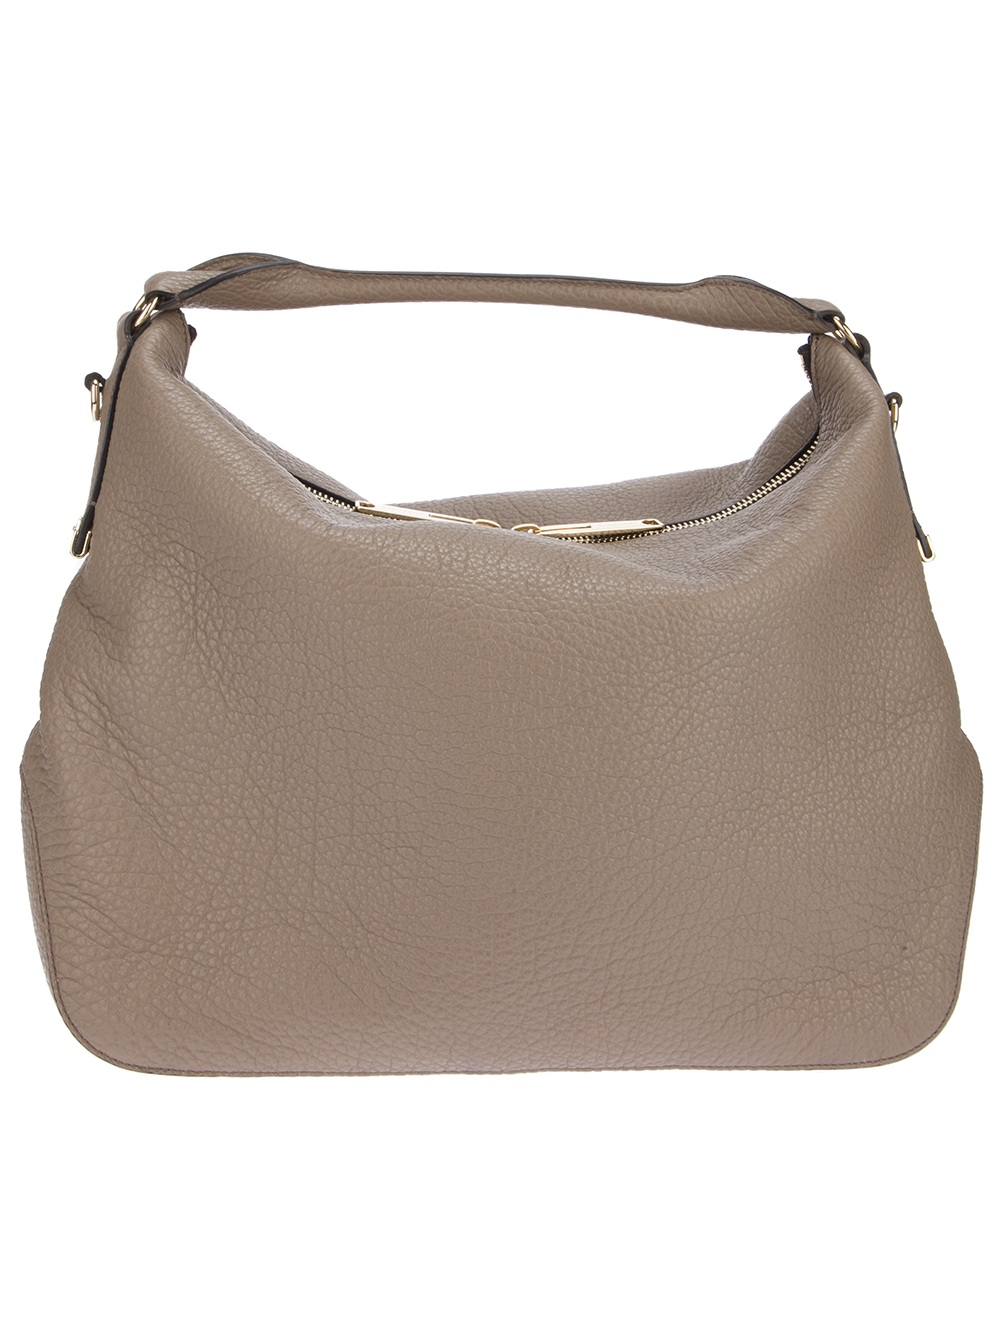 Burberry Ledbury Hobo Bag in Brown | Lyst